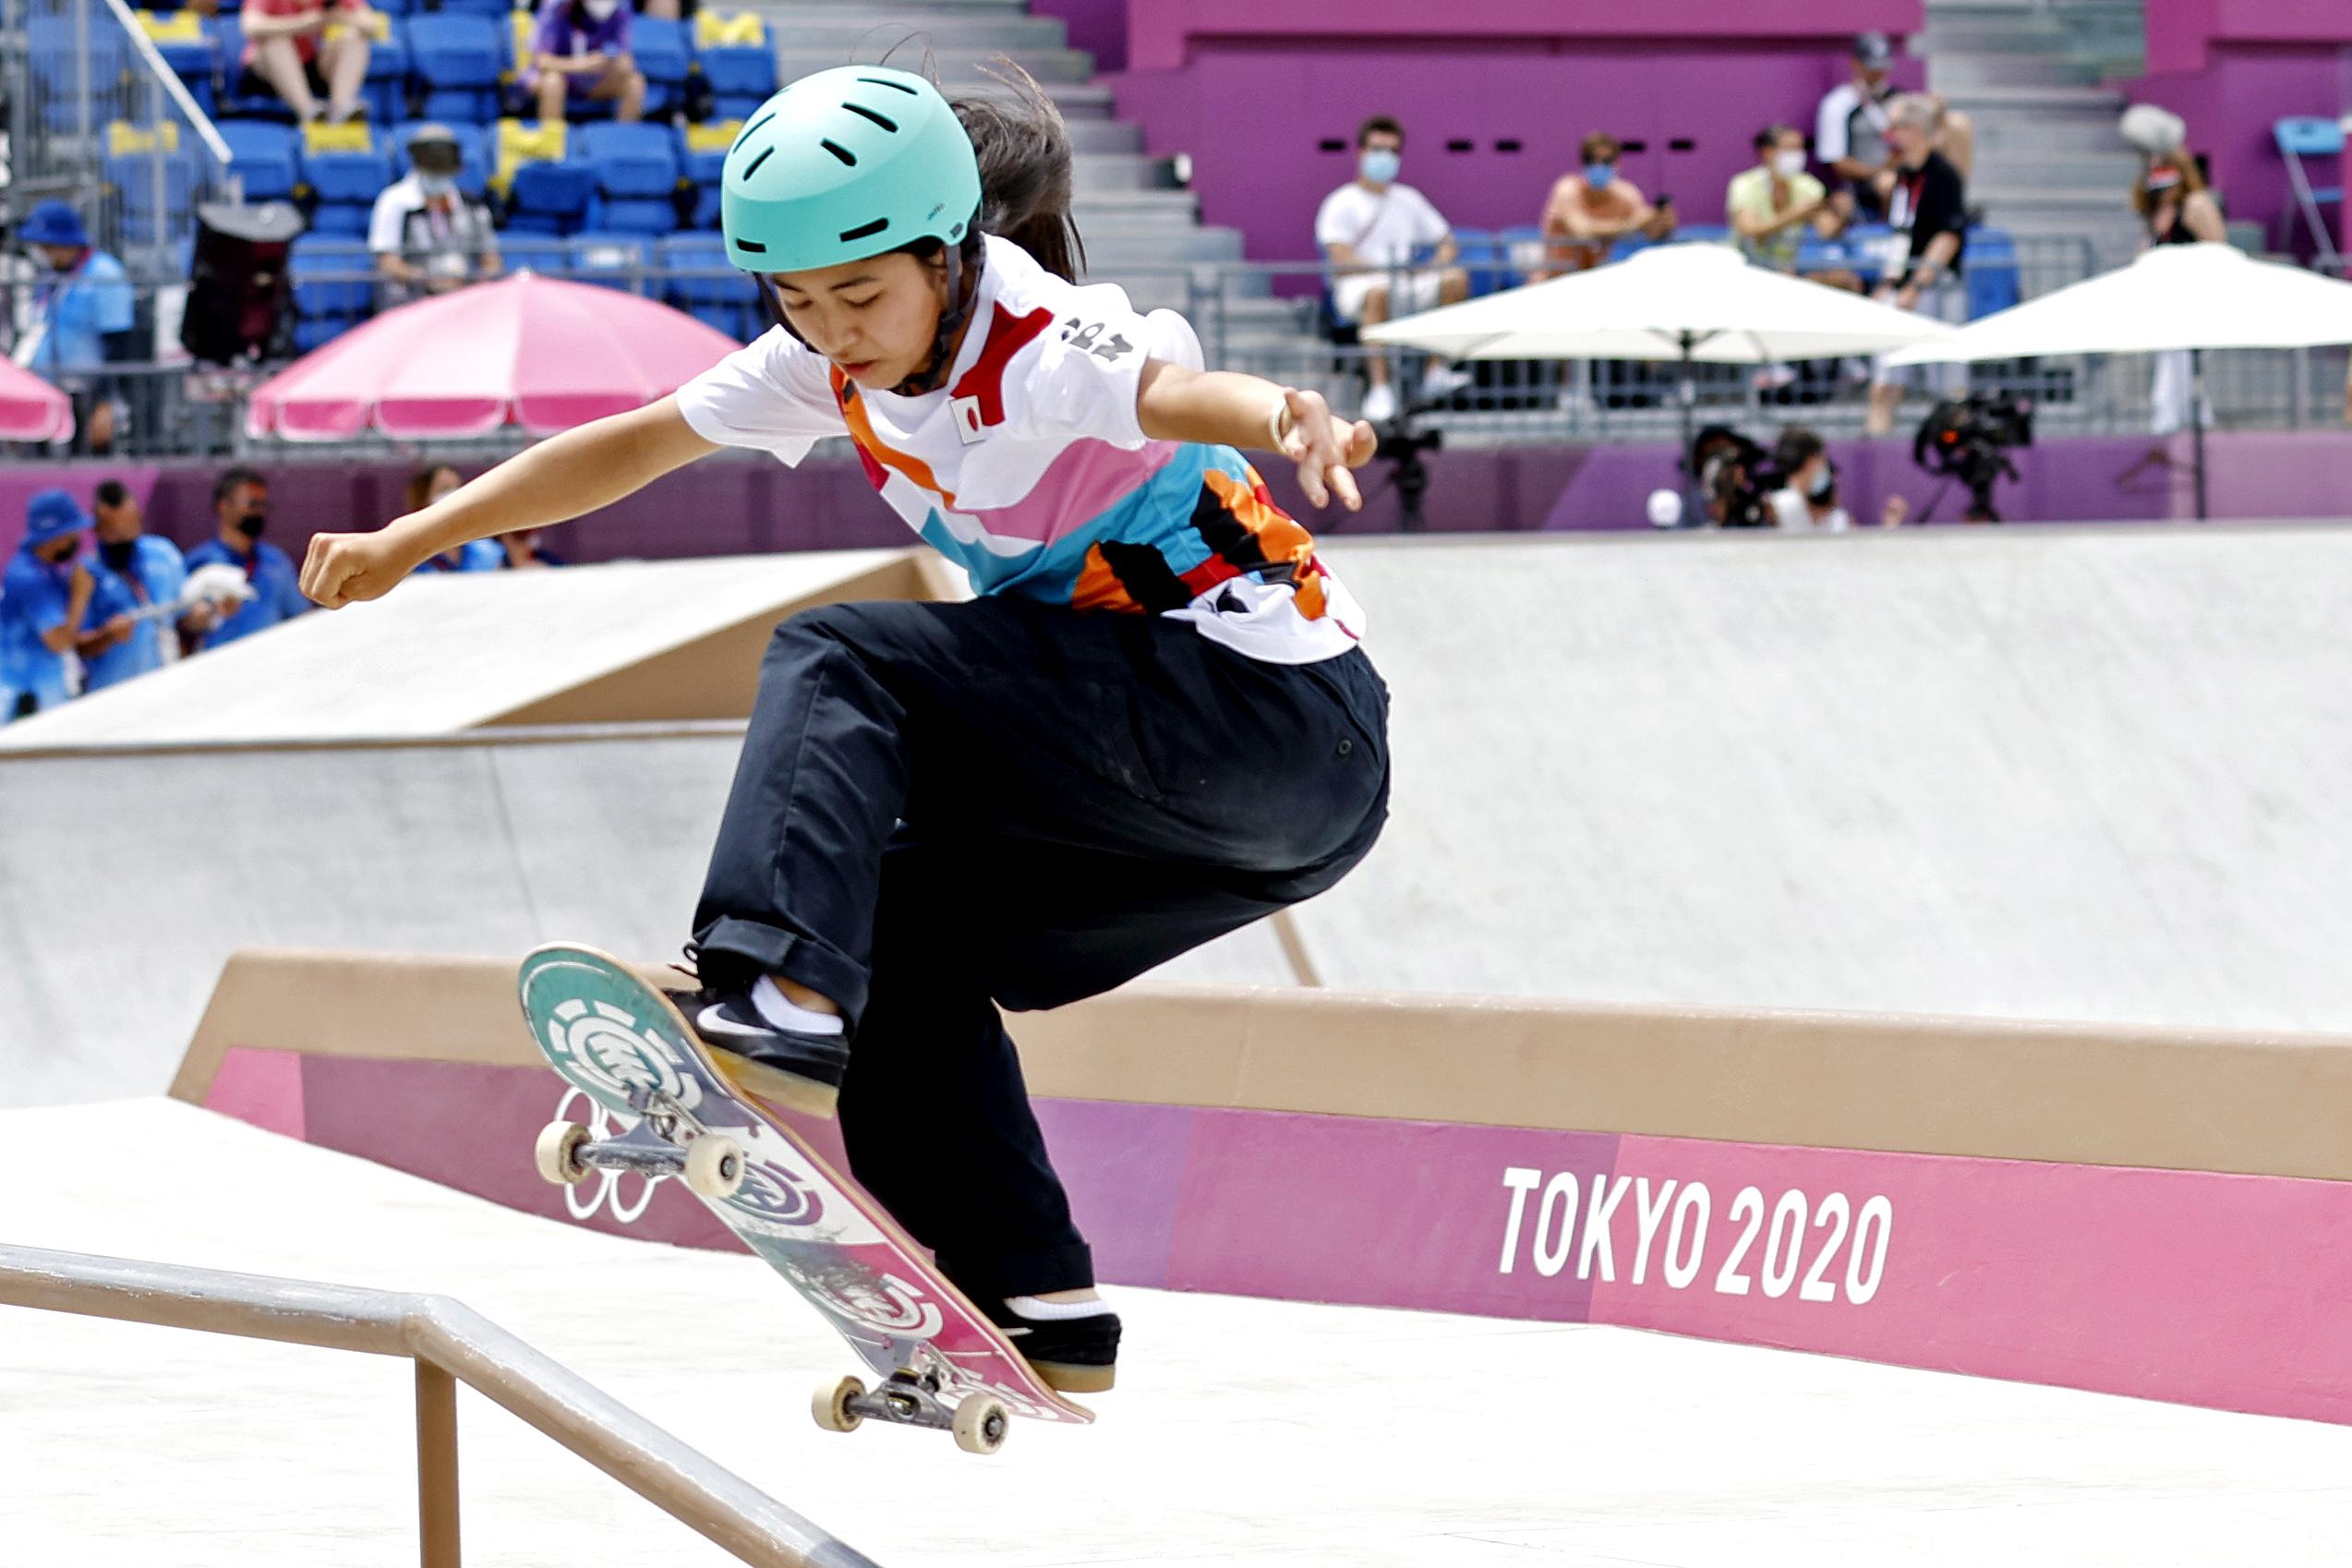 Jul 26, 2021; Tokyo, Japan; Funa Nakayama (JPN) competes in the womens street skateboard during the Tokyo 2020 Olympic Summer Games at Ariake Urban Sports Park. Mandatory Credit: Geoff Burke-USA TODAY Sports